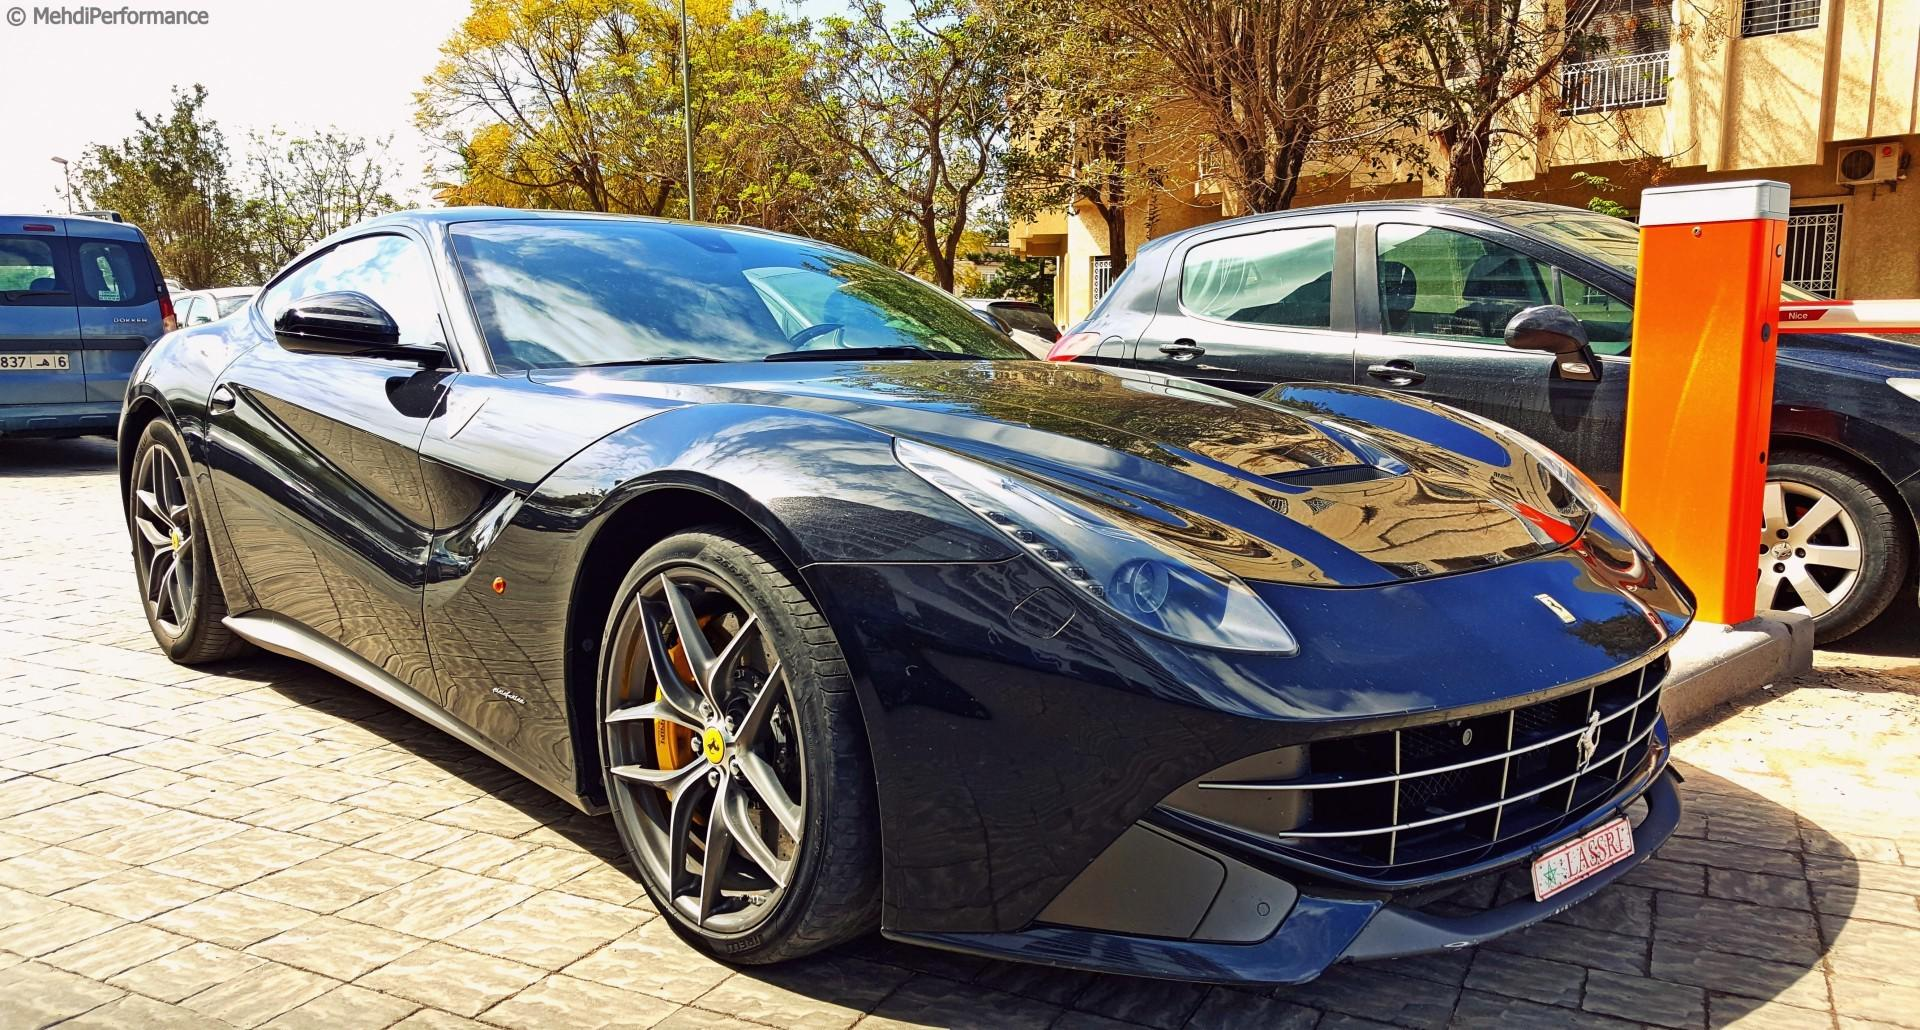 Ferrari F12 Berlinetta : Plaque  spéciale au Maroc !